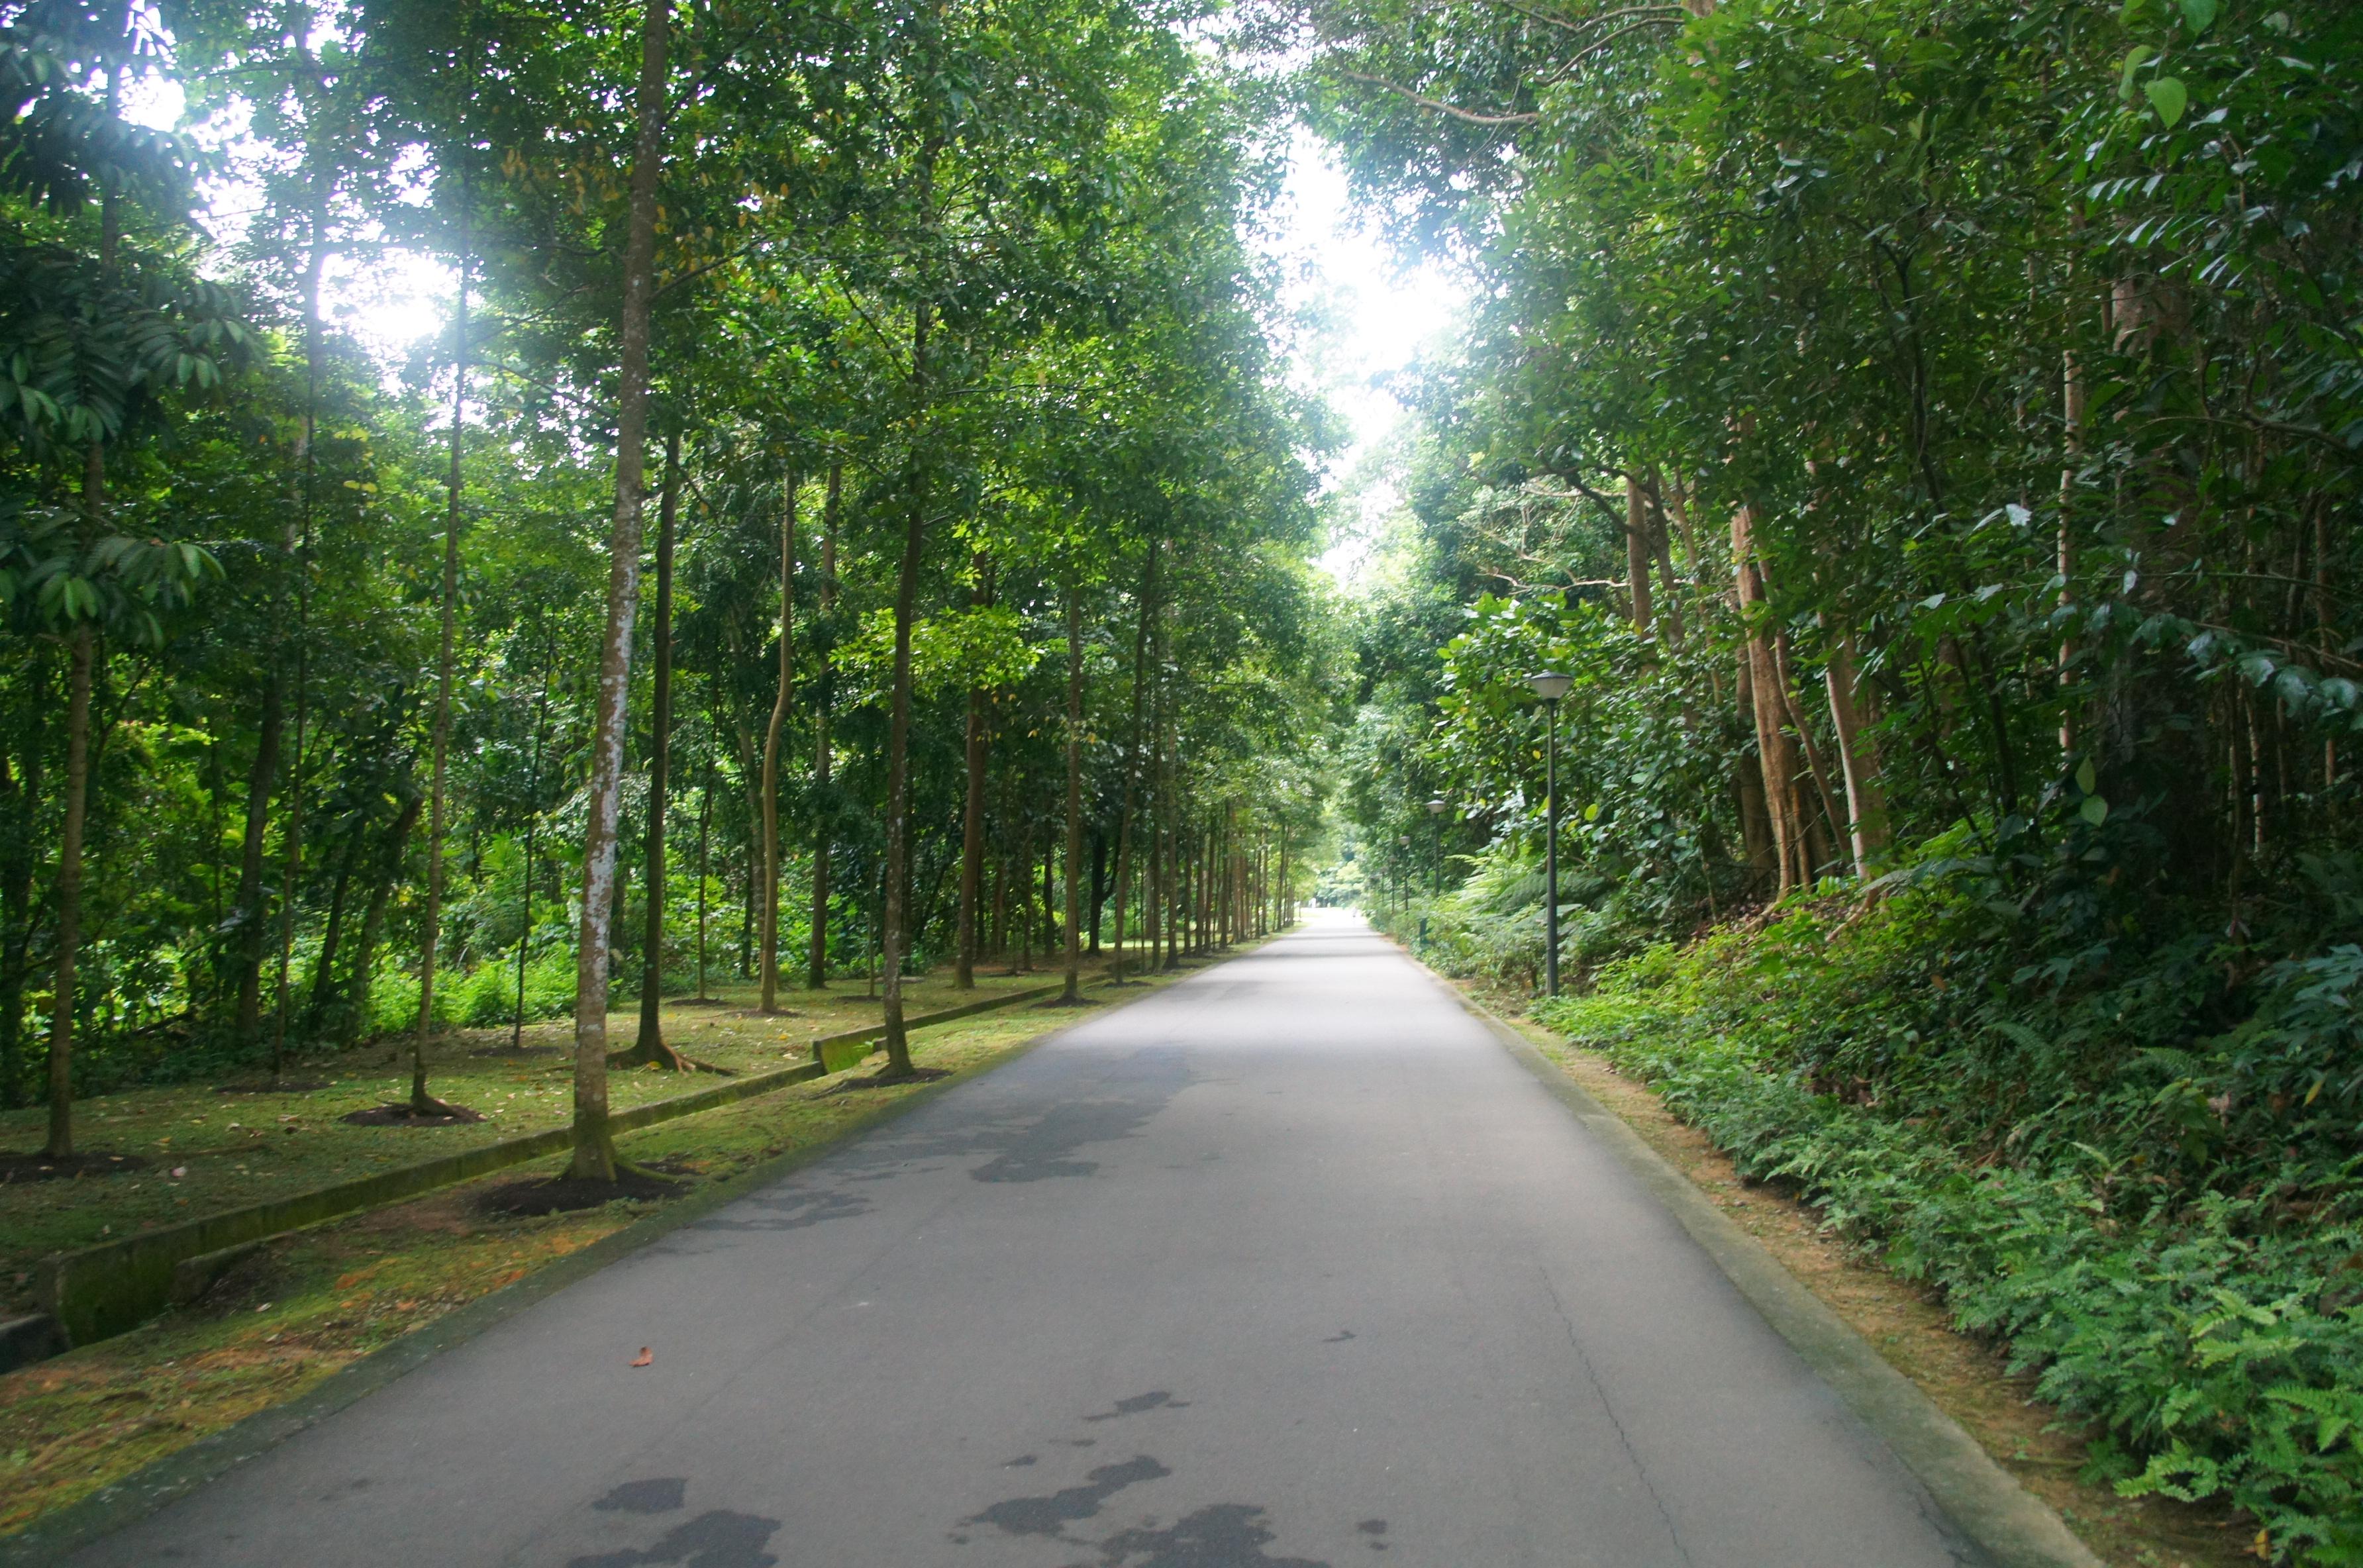 7 Bukit Batok Nature Park Ndash My Experiences